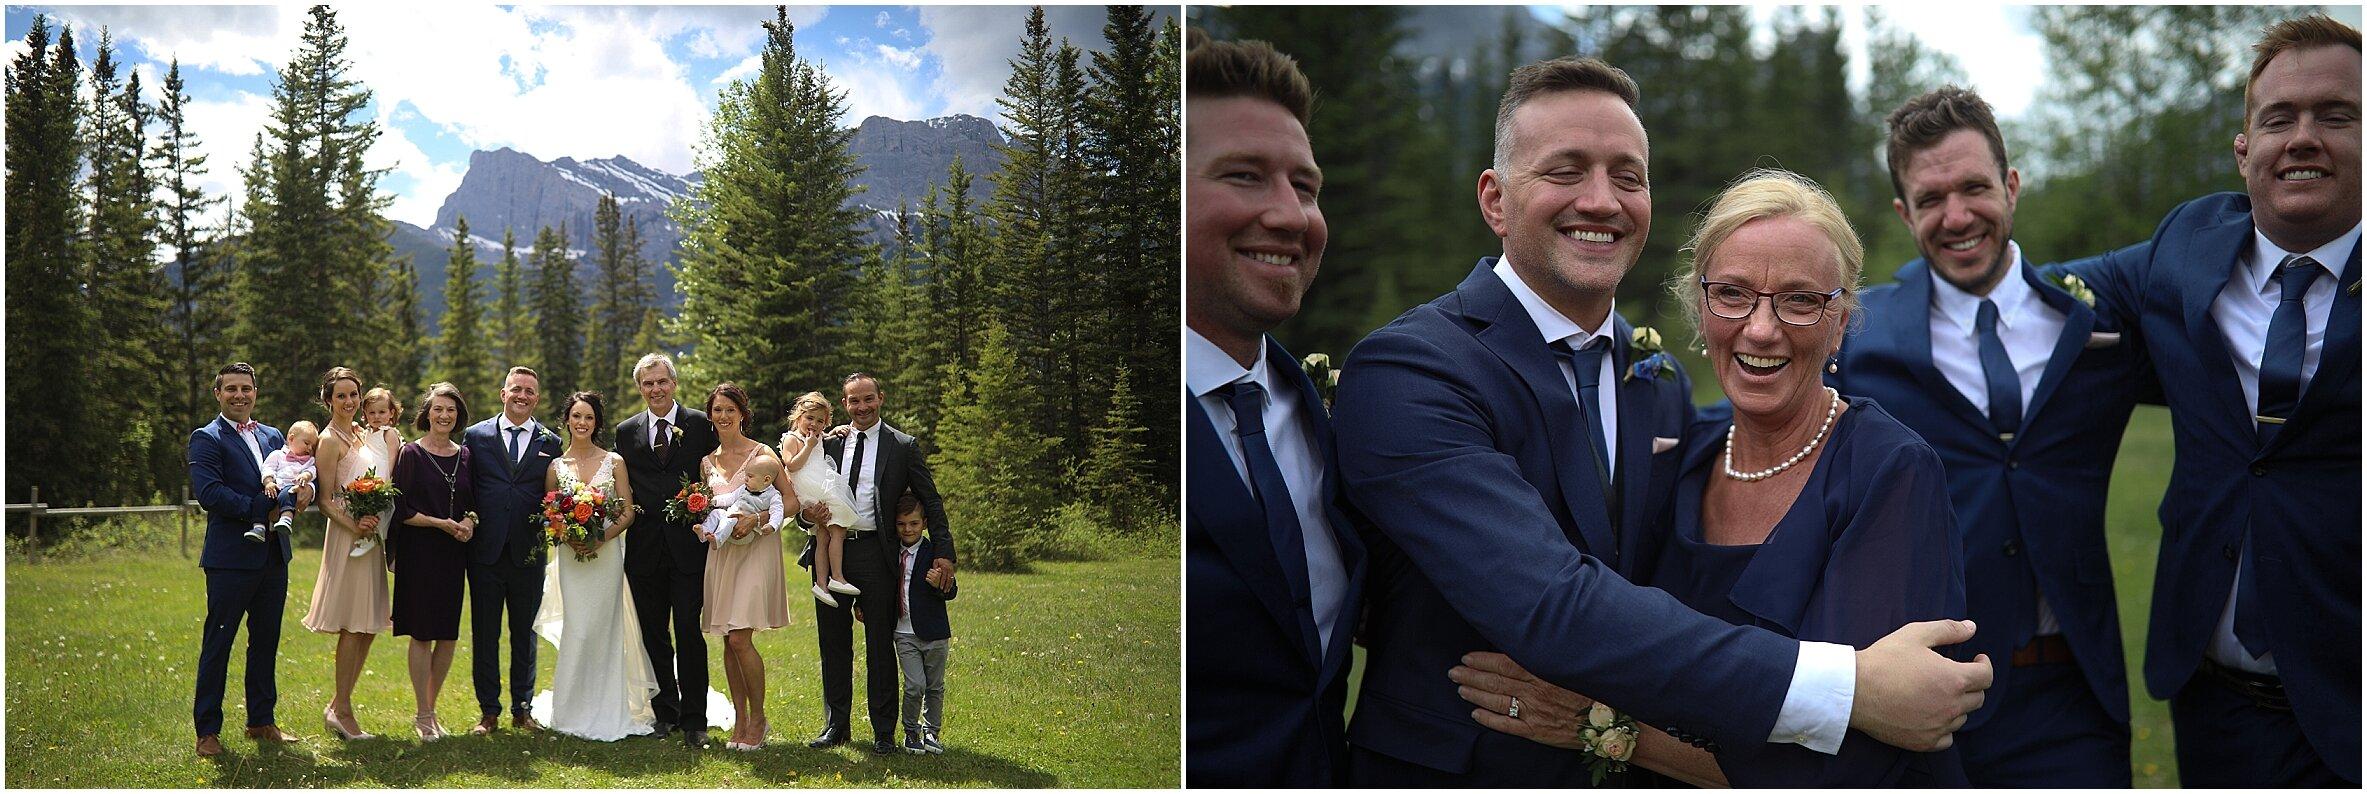 Canmore-Cornerstone-wedding-photography (18).jpg